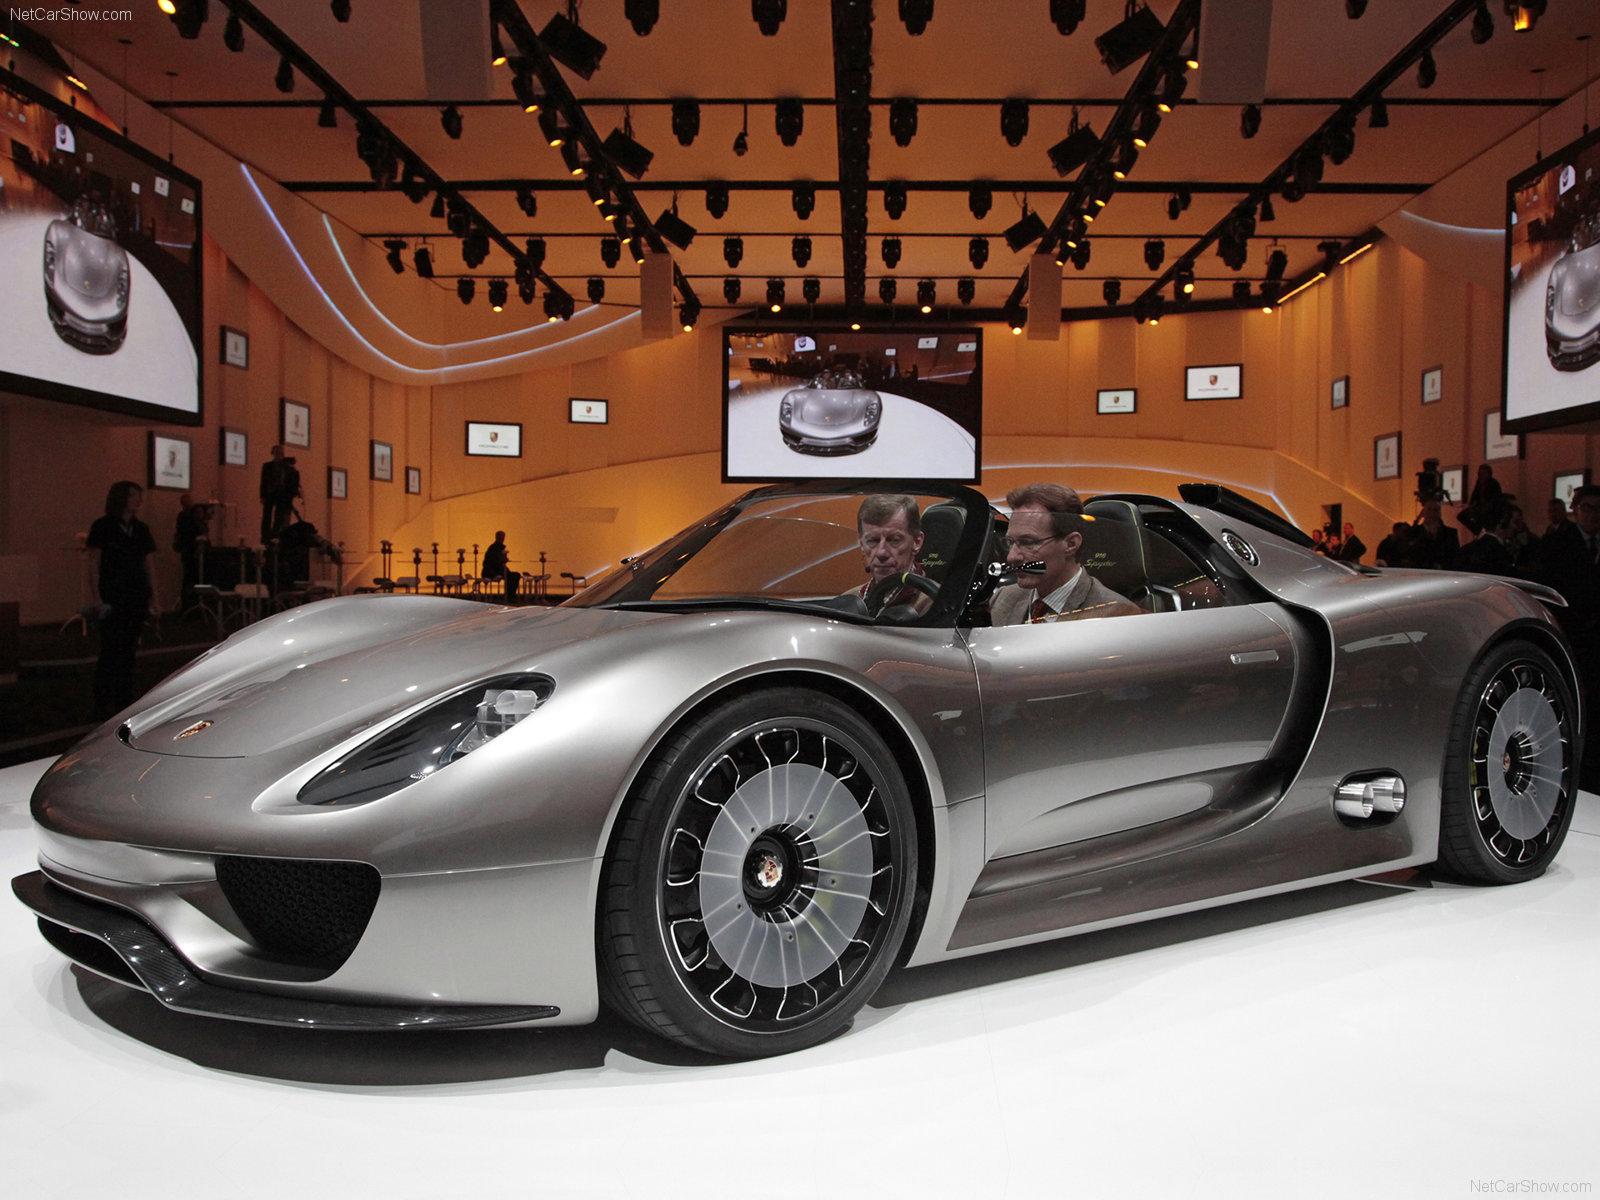 Porsche-918_Spyder_Concept_2010_1600x1200_wallpaper_0c Gorgeous How Much is the Porsche 918 Spyder Concept In Real Racing 3 Cars Trend